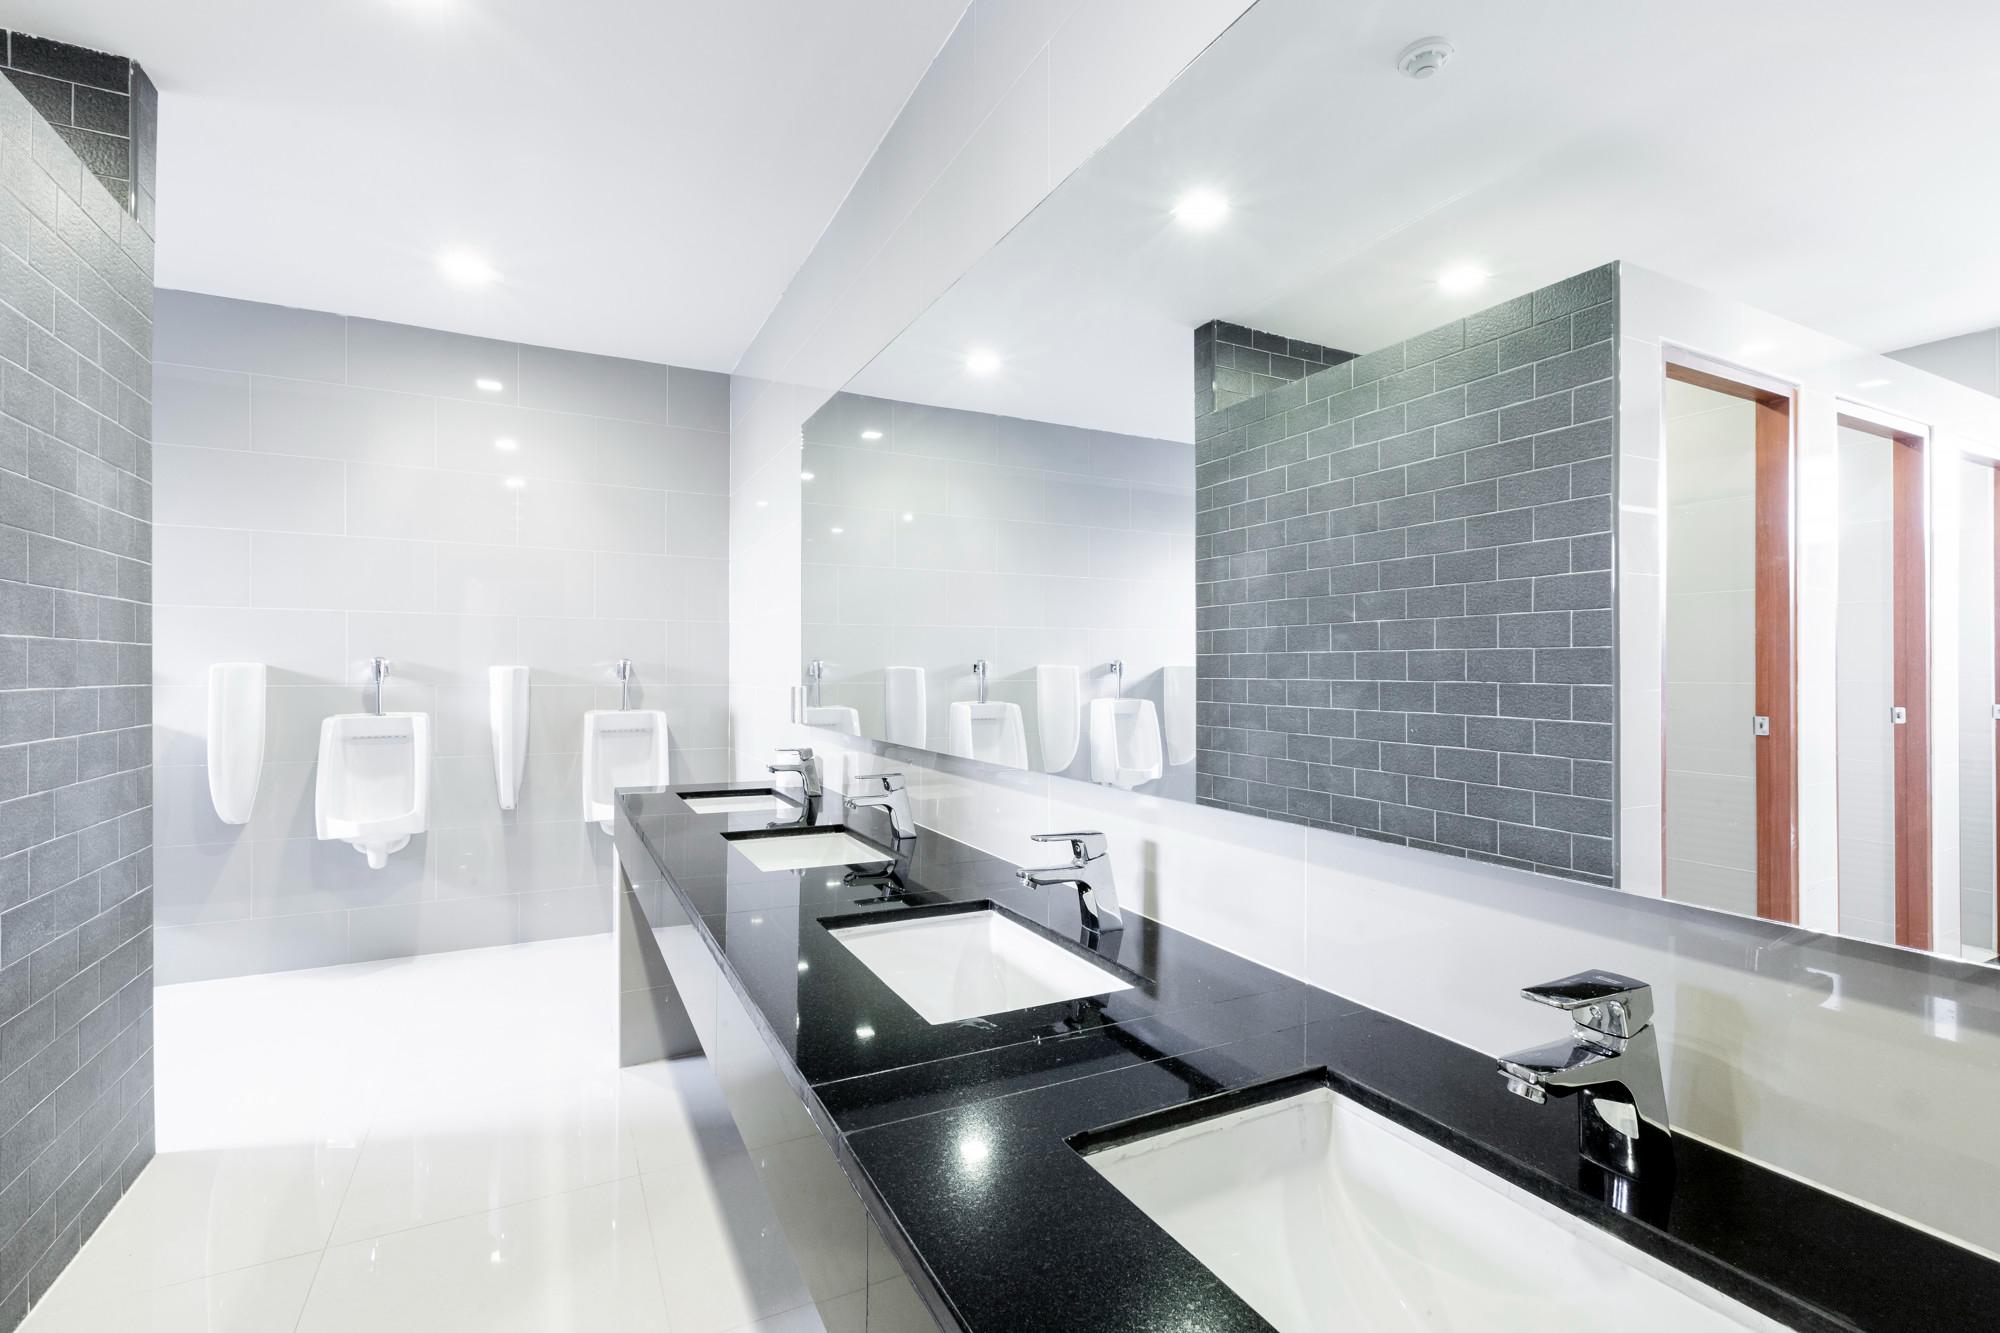 Clean bathroom with brick tiled walls